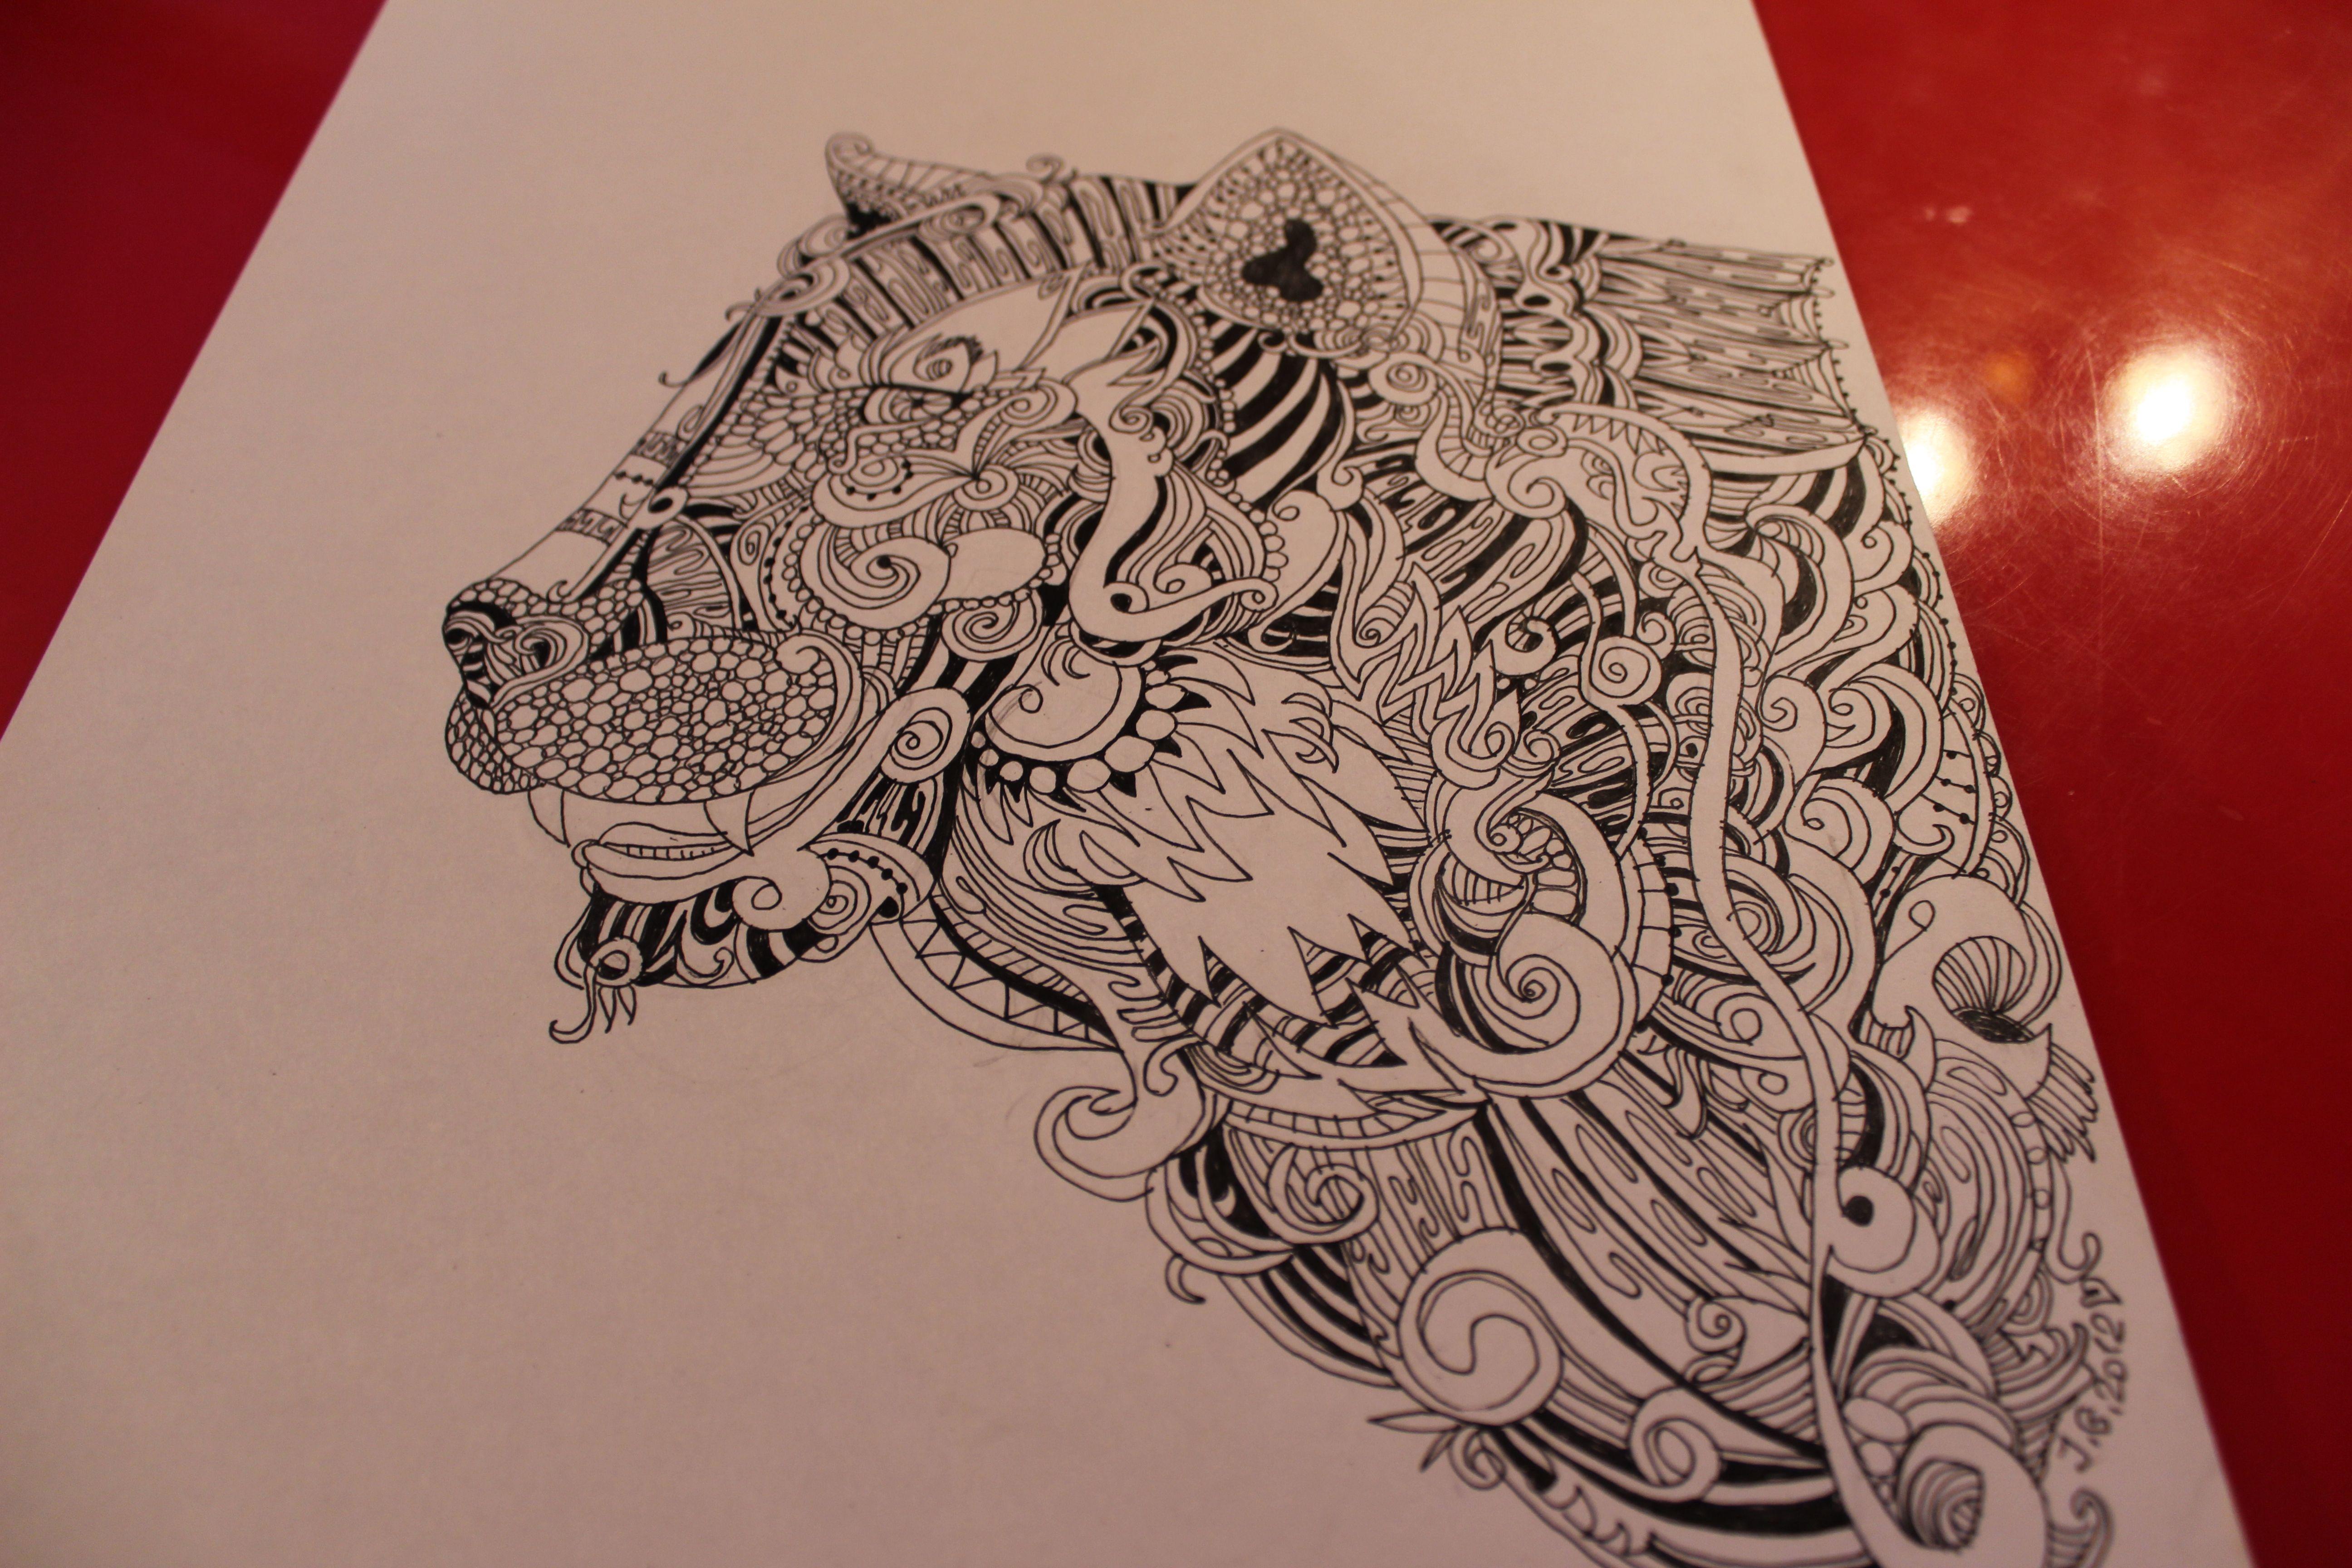 #tiger #Russia #art #print #design #wear #accessories #handmade #love #illustration #ink #tatoo #style #pen #inkart #draw #shirt